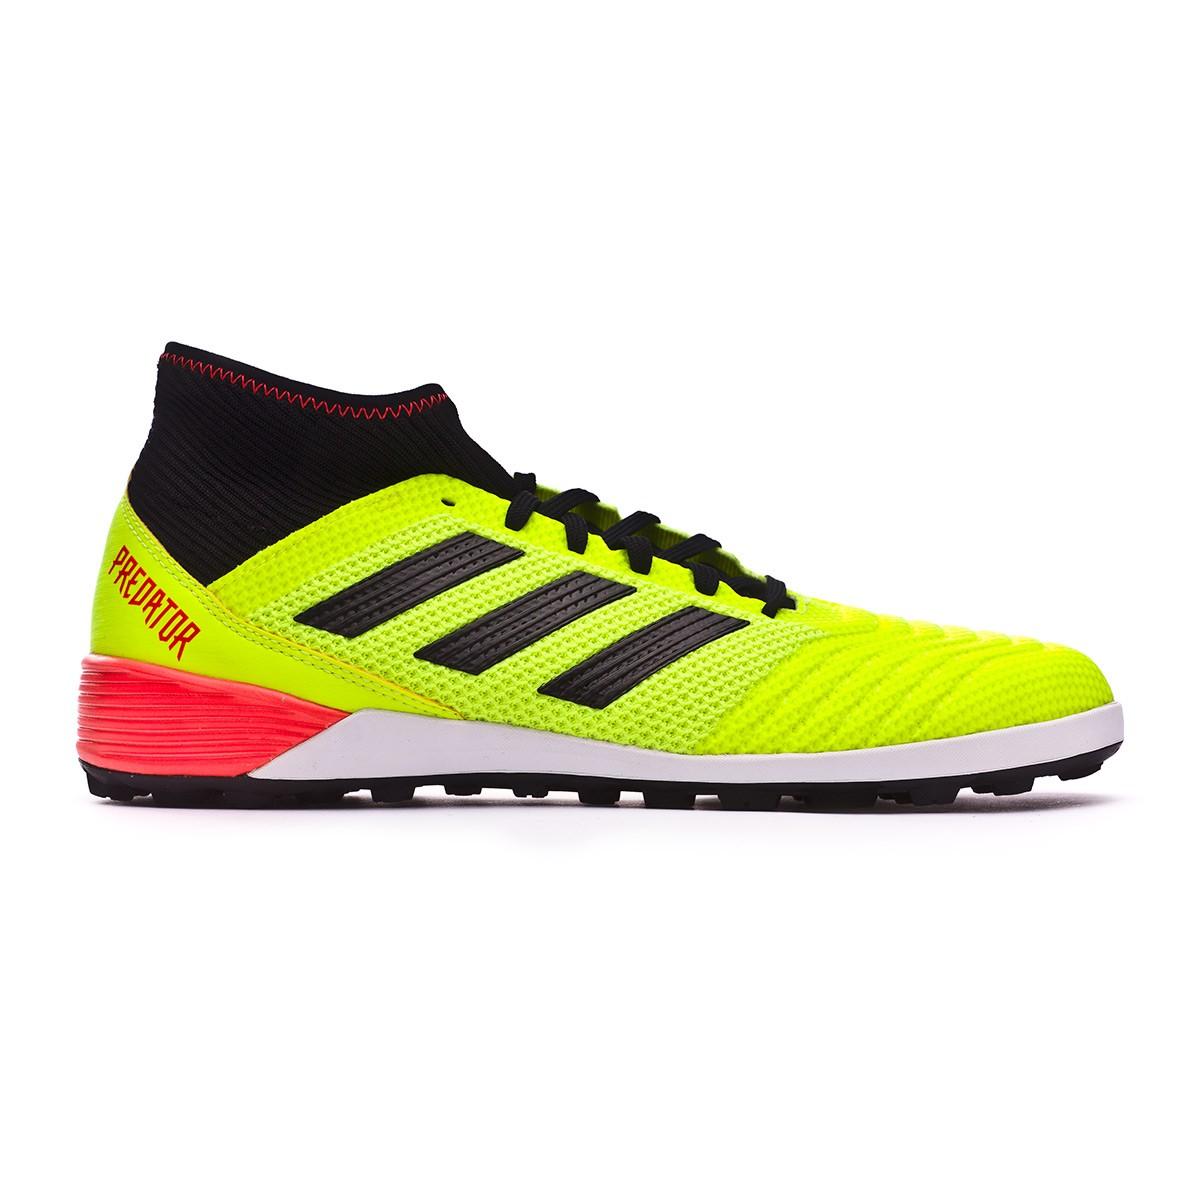 3c2ea371f Football Boot adidas Predator Tango 18.3 Turf Solar yellow-Black-Solar red  - Football store Fútbol Emotion